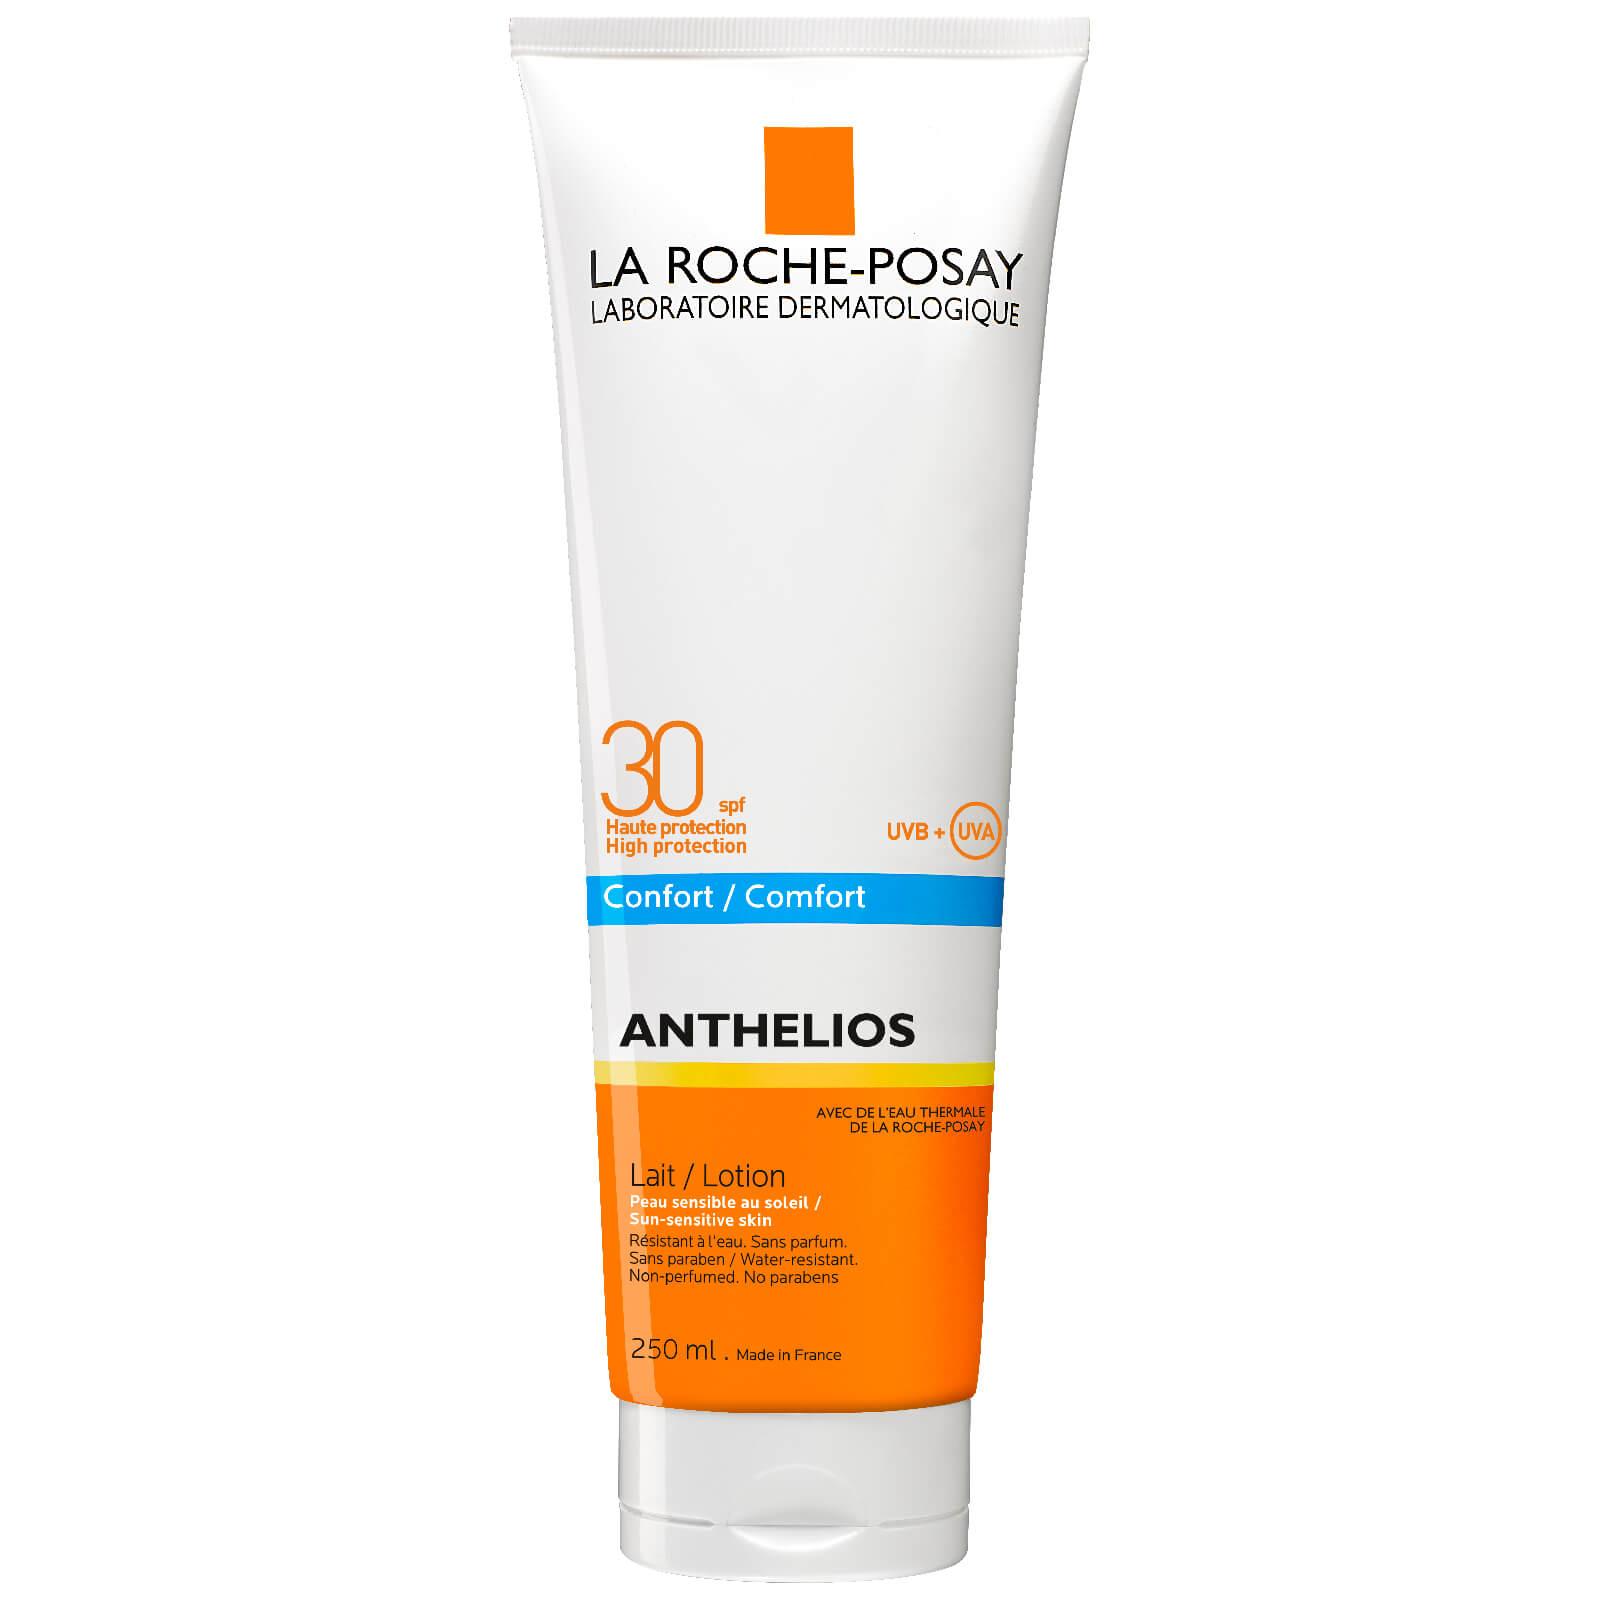 La Roche-Posay Lait Solaire Anthélios SPF 30 250 ml La Roche-Posay